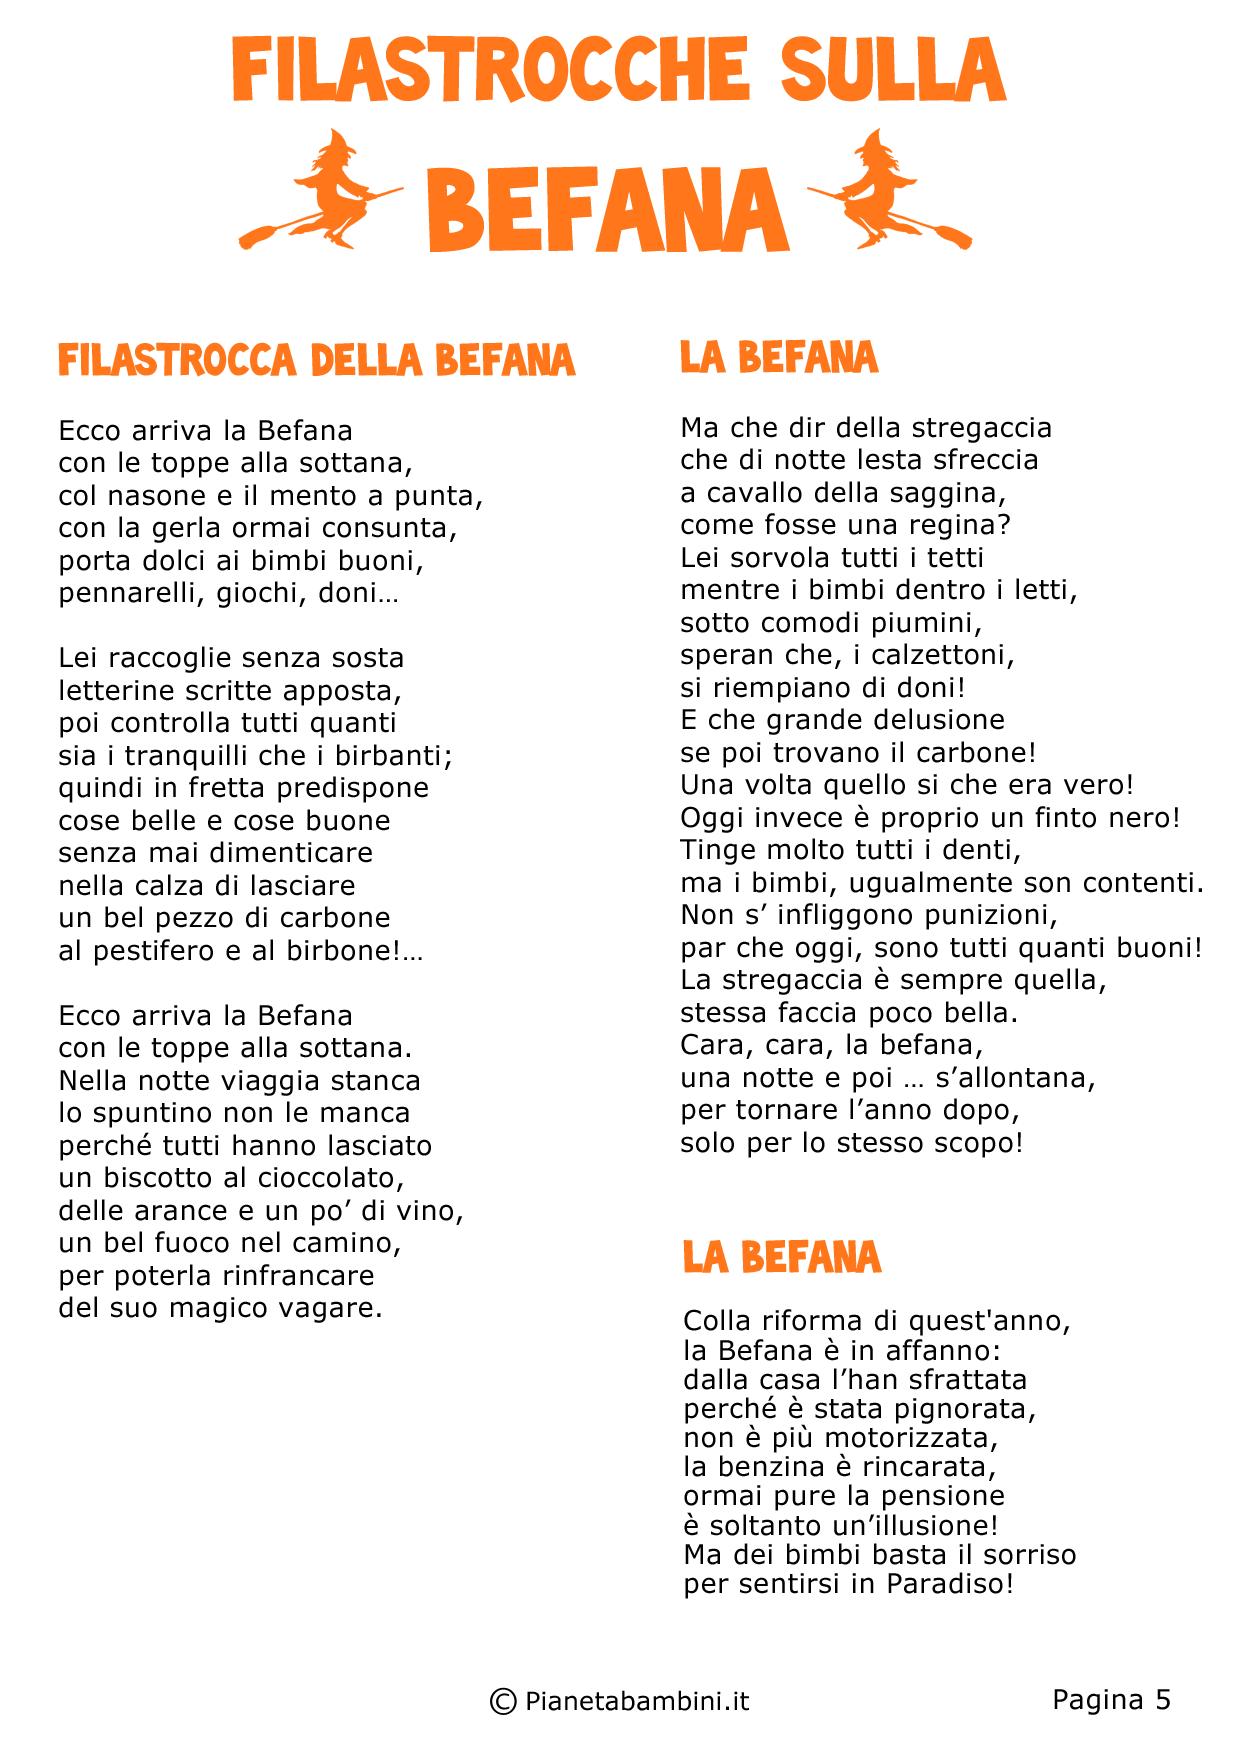 Filastrocche-Befana-5